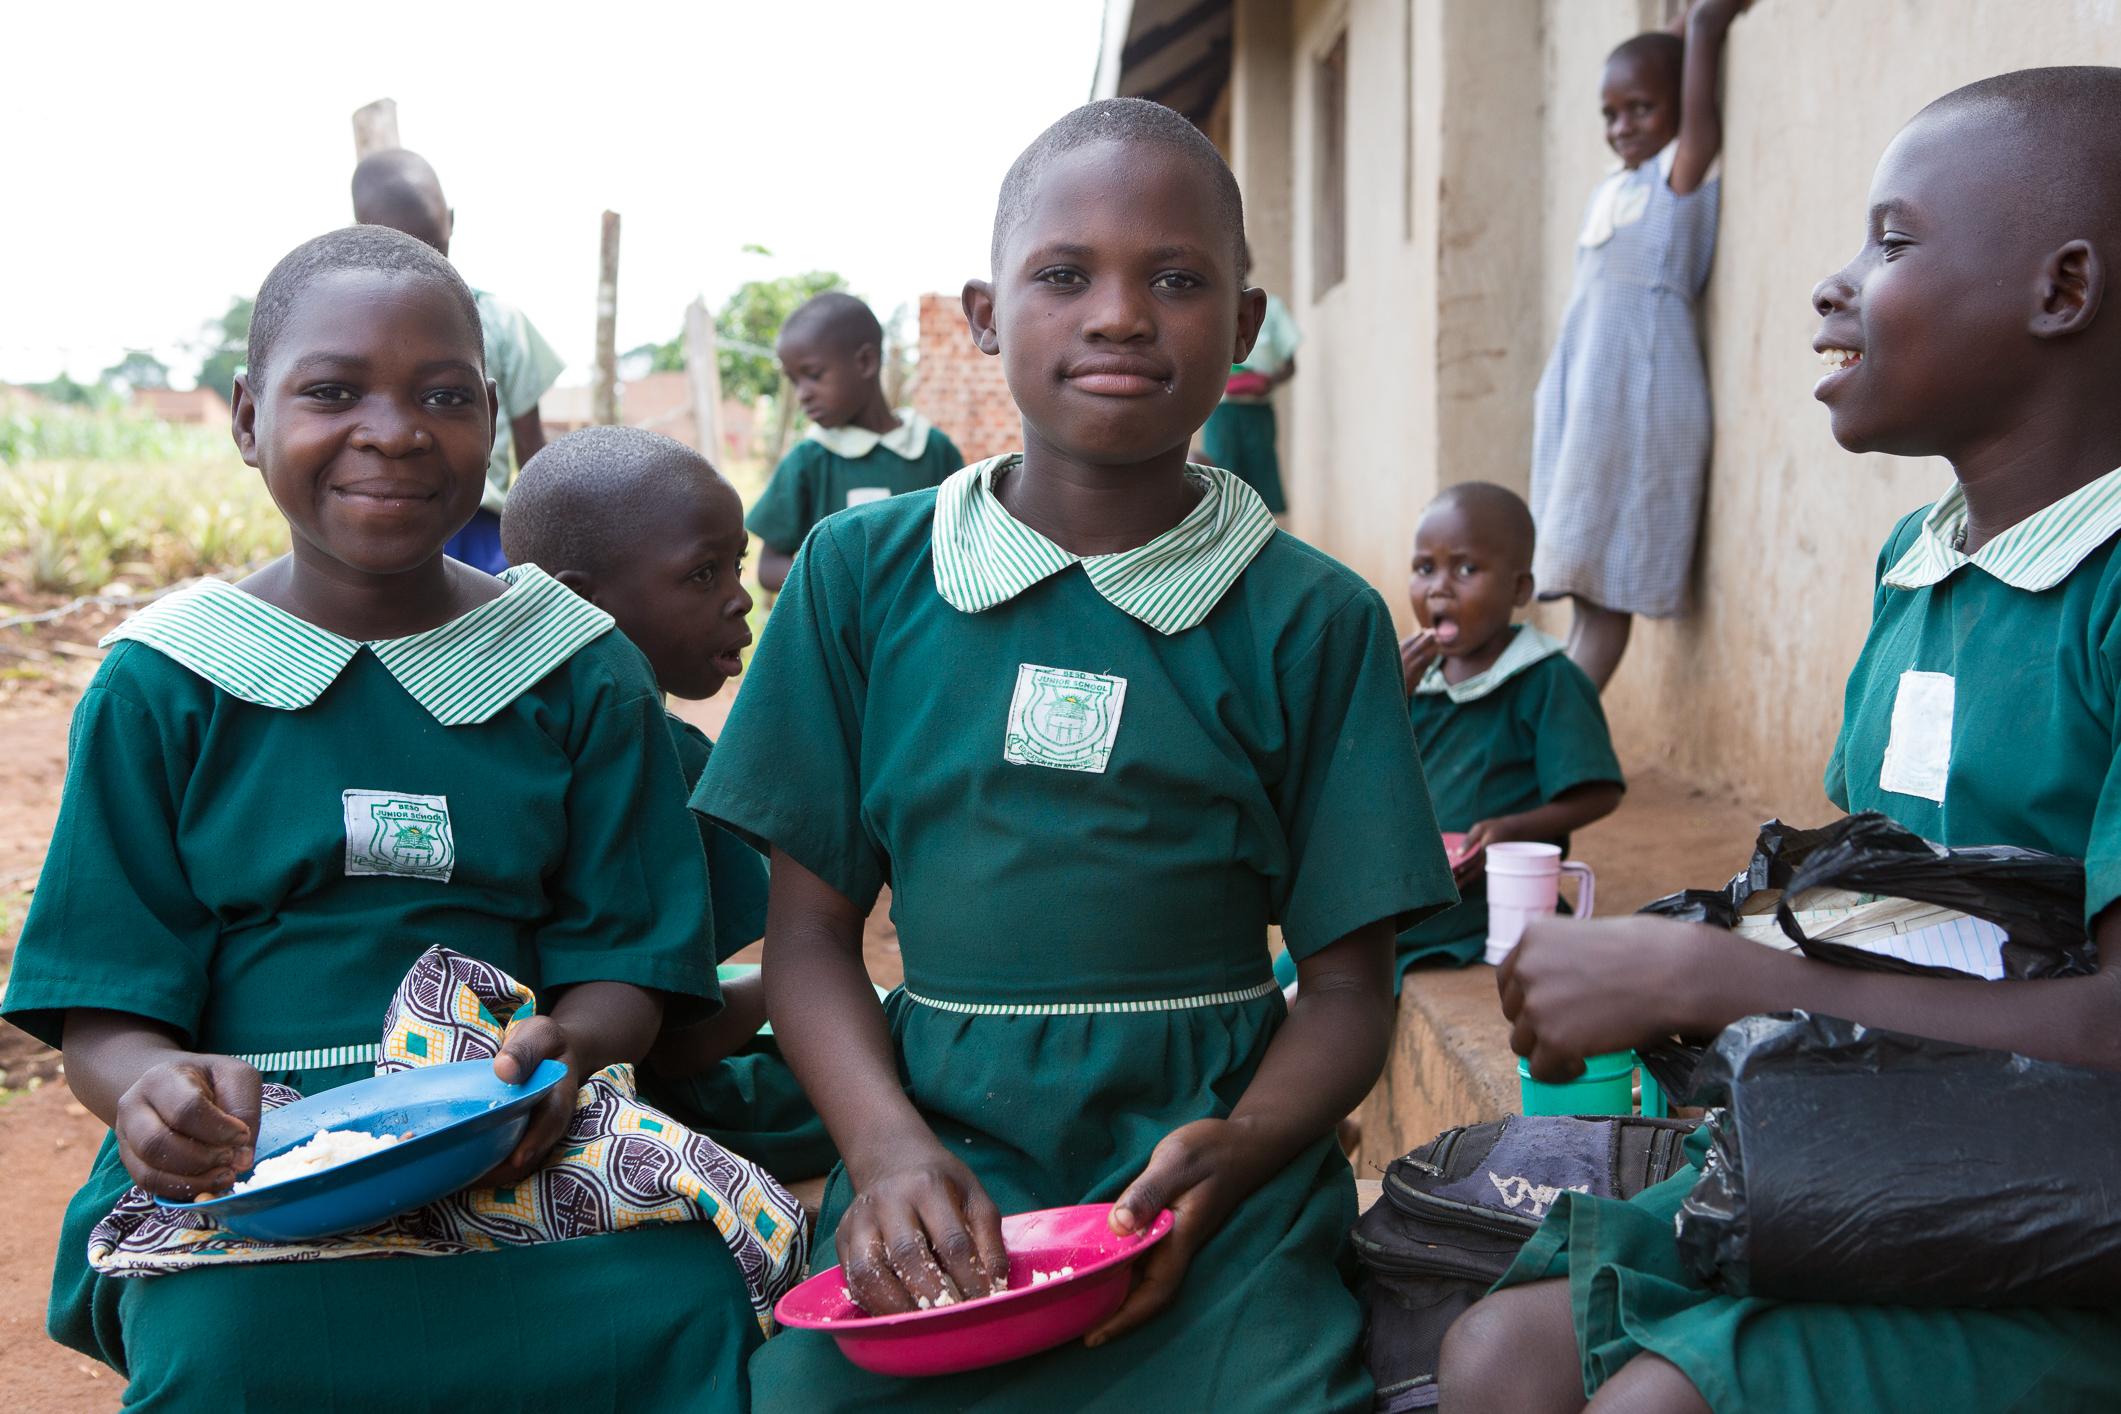 Students, Robina and Cheru, enjoying their free school lunches